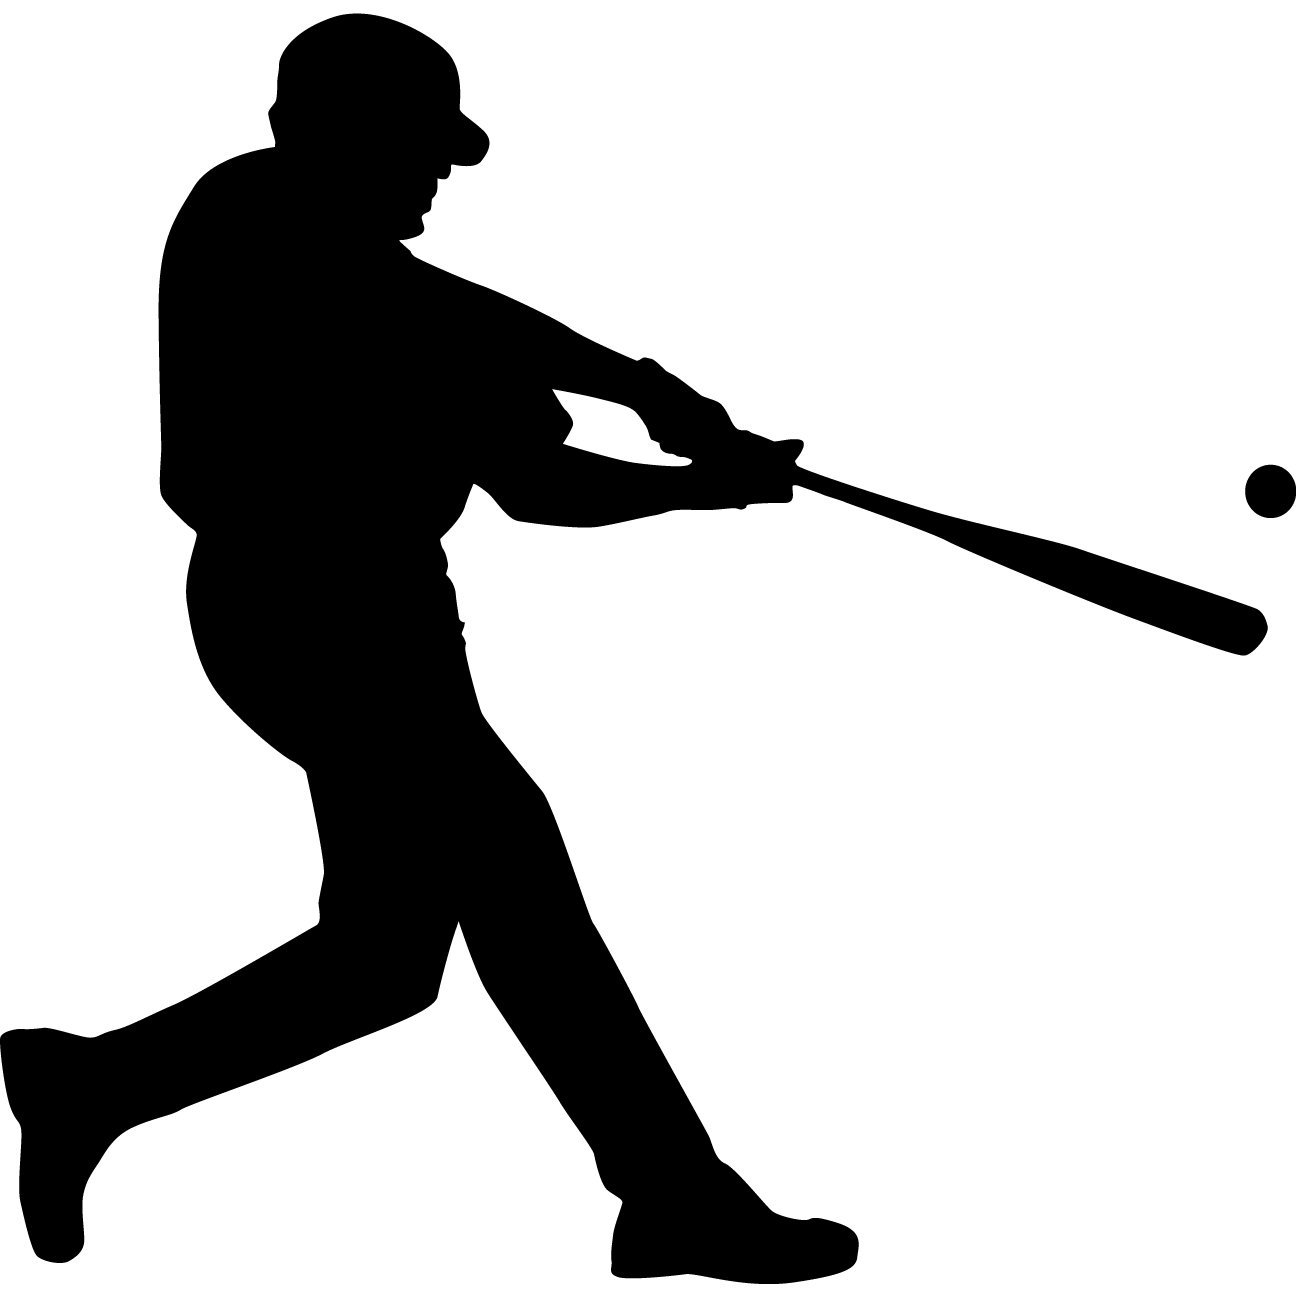 1296x1296 Baseball Player Silhouette Yiqiqu Beauteous Players Silhouettes